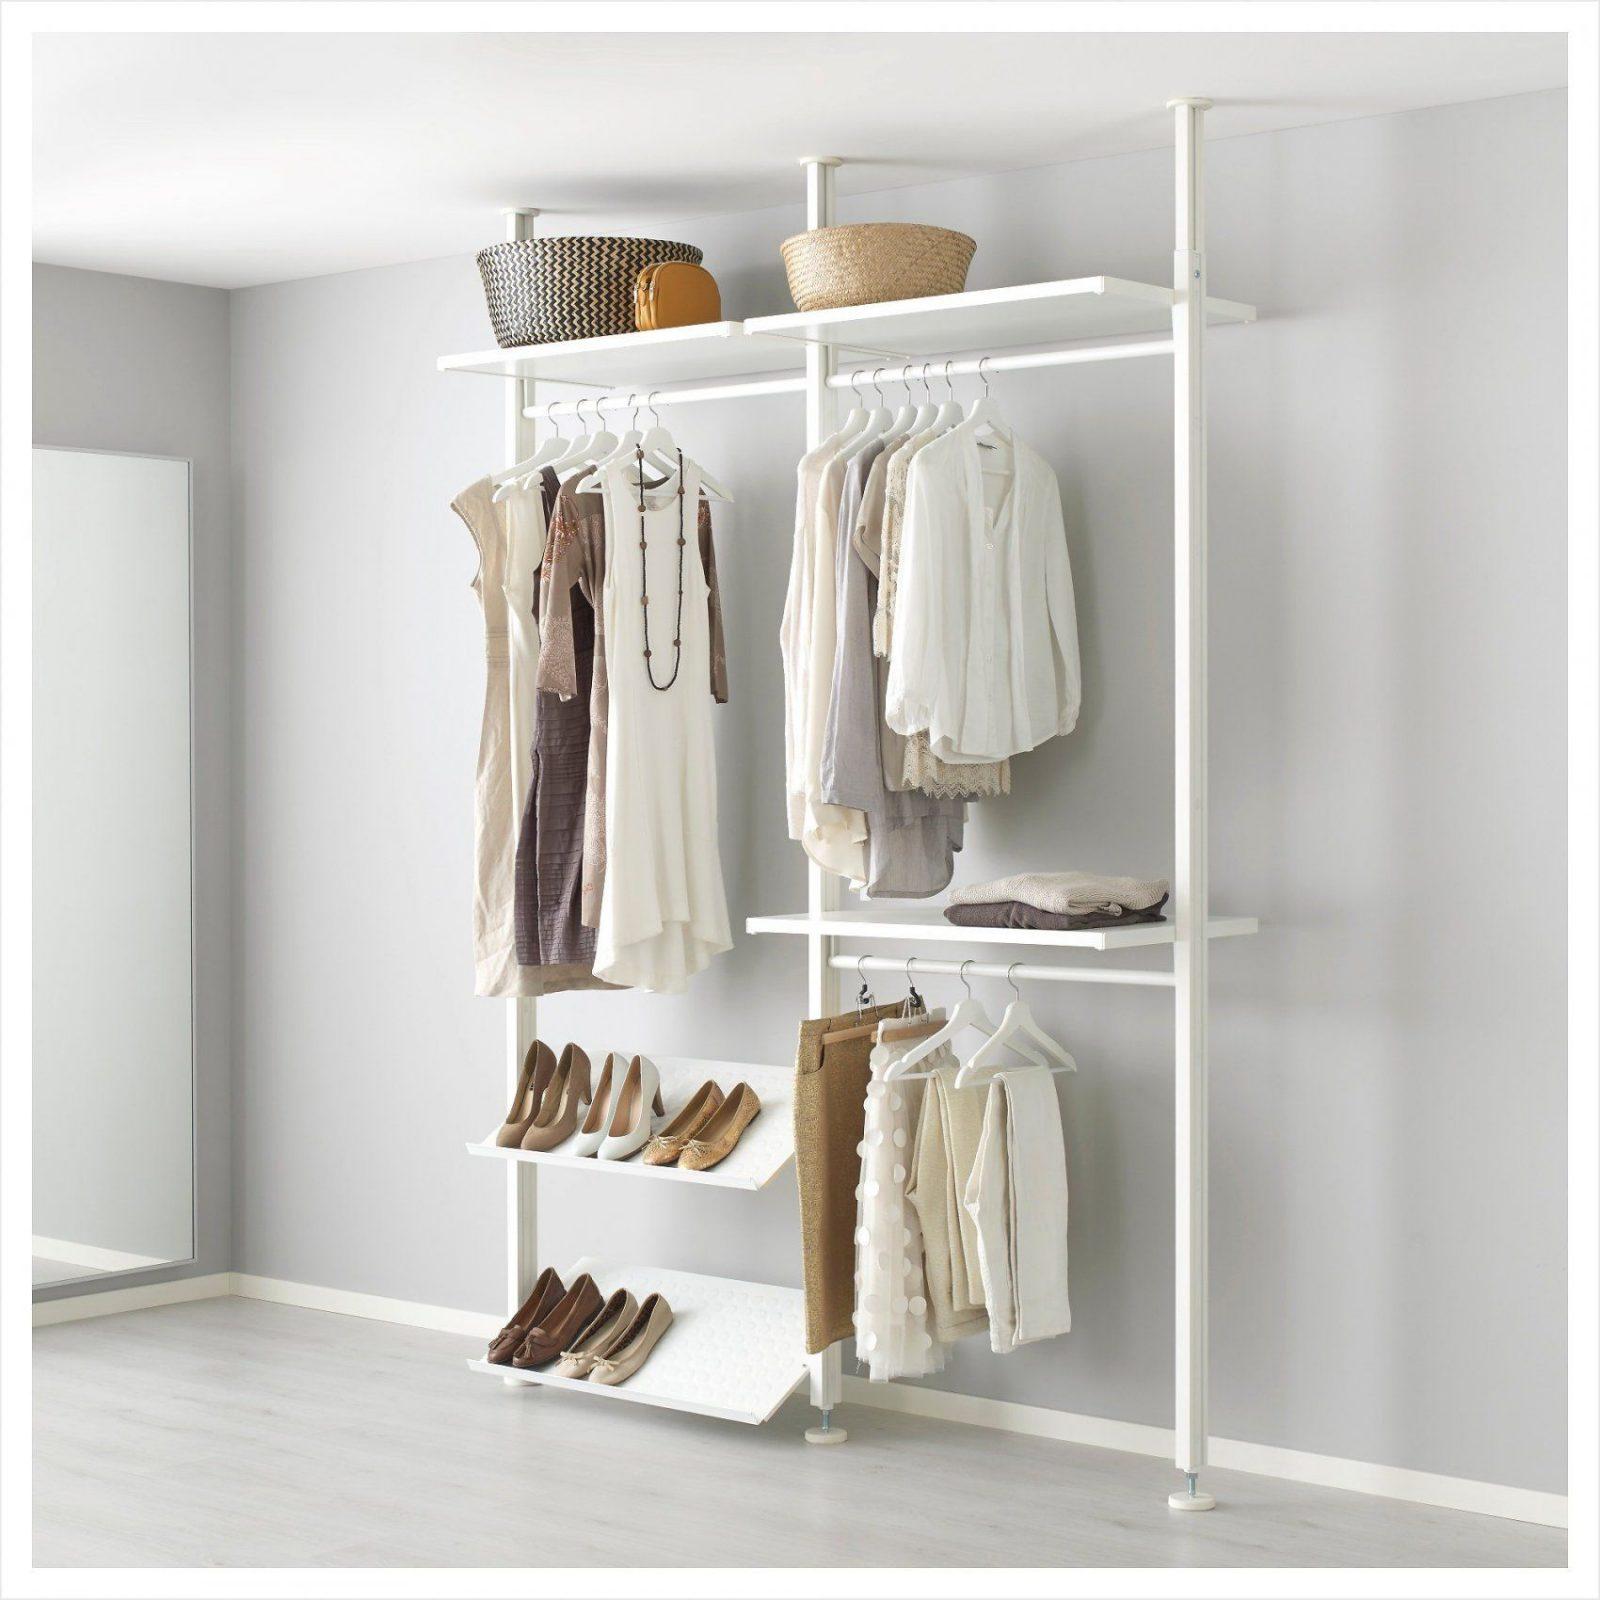 Luxury Spannende Ideen Begehbarer Kleiderschrank Ikea Stolmen Pax von Begehbarer Kleiderschrank Ikea Stolmen Bild